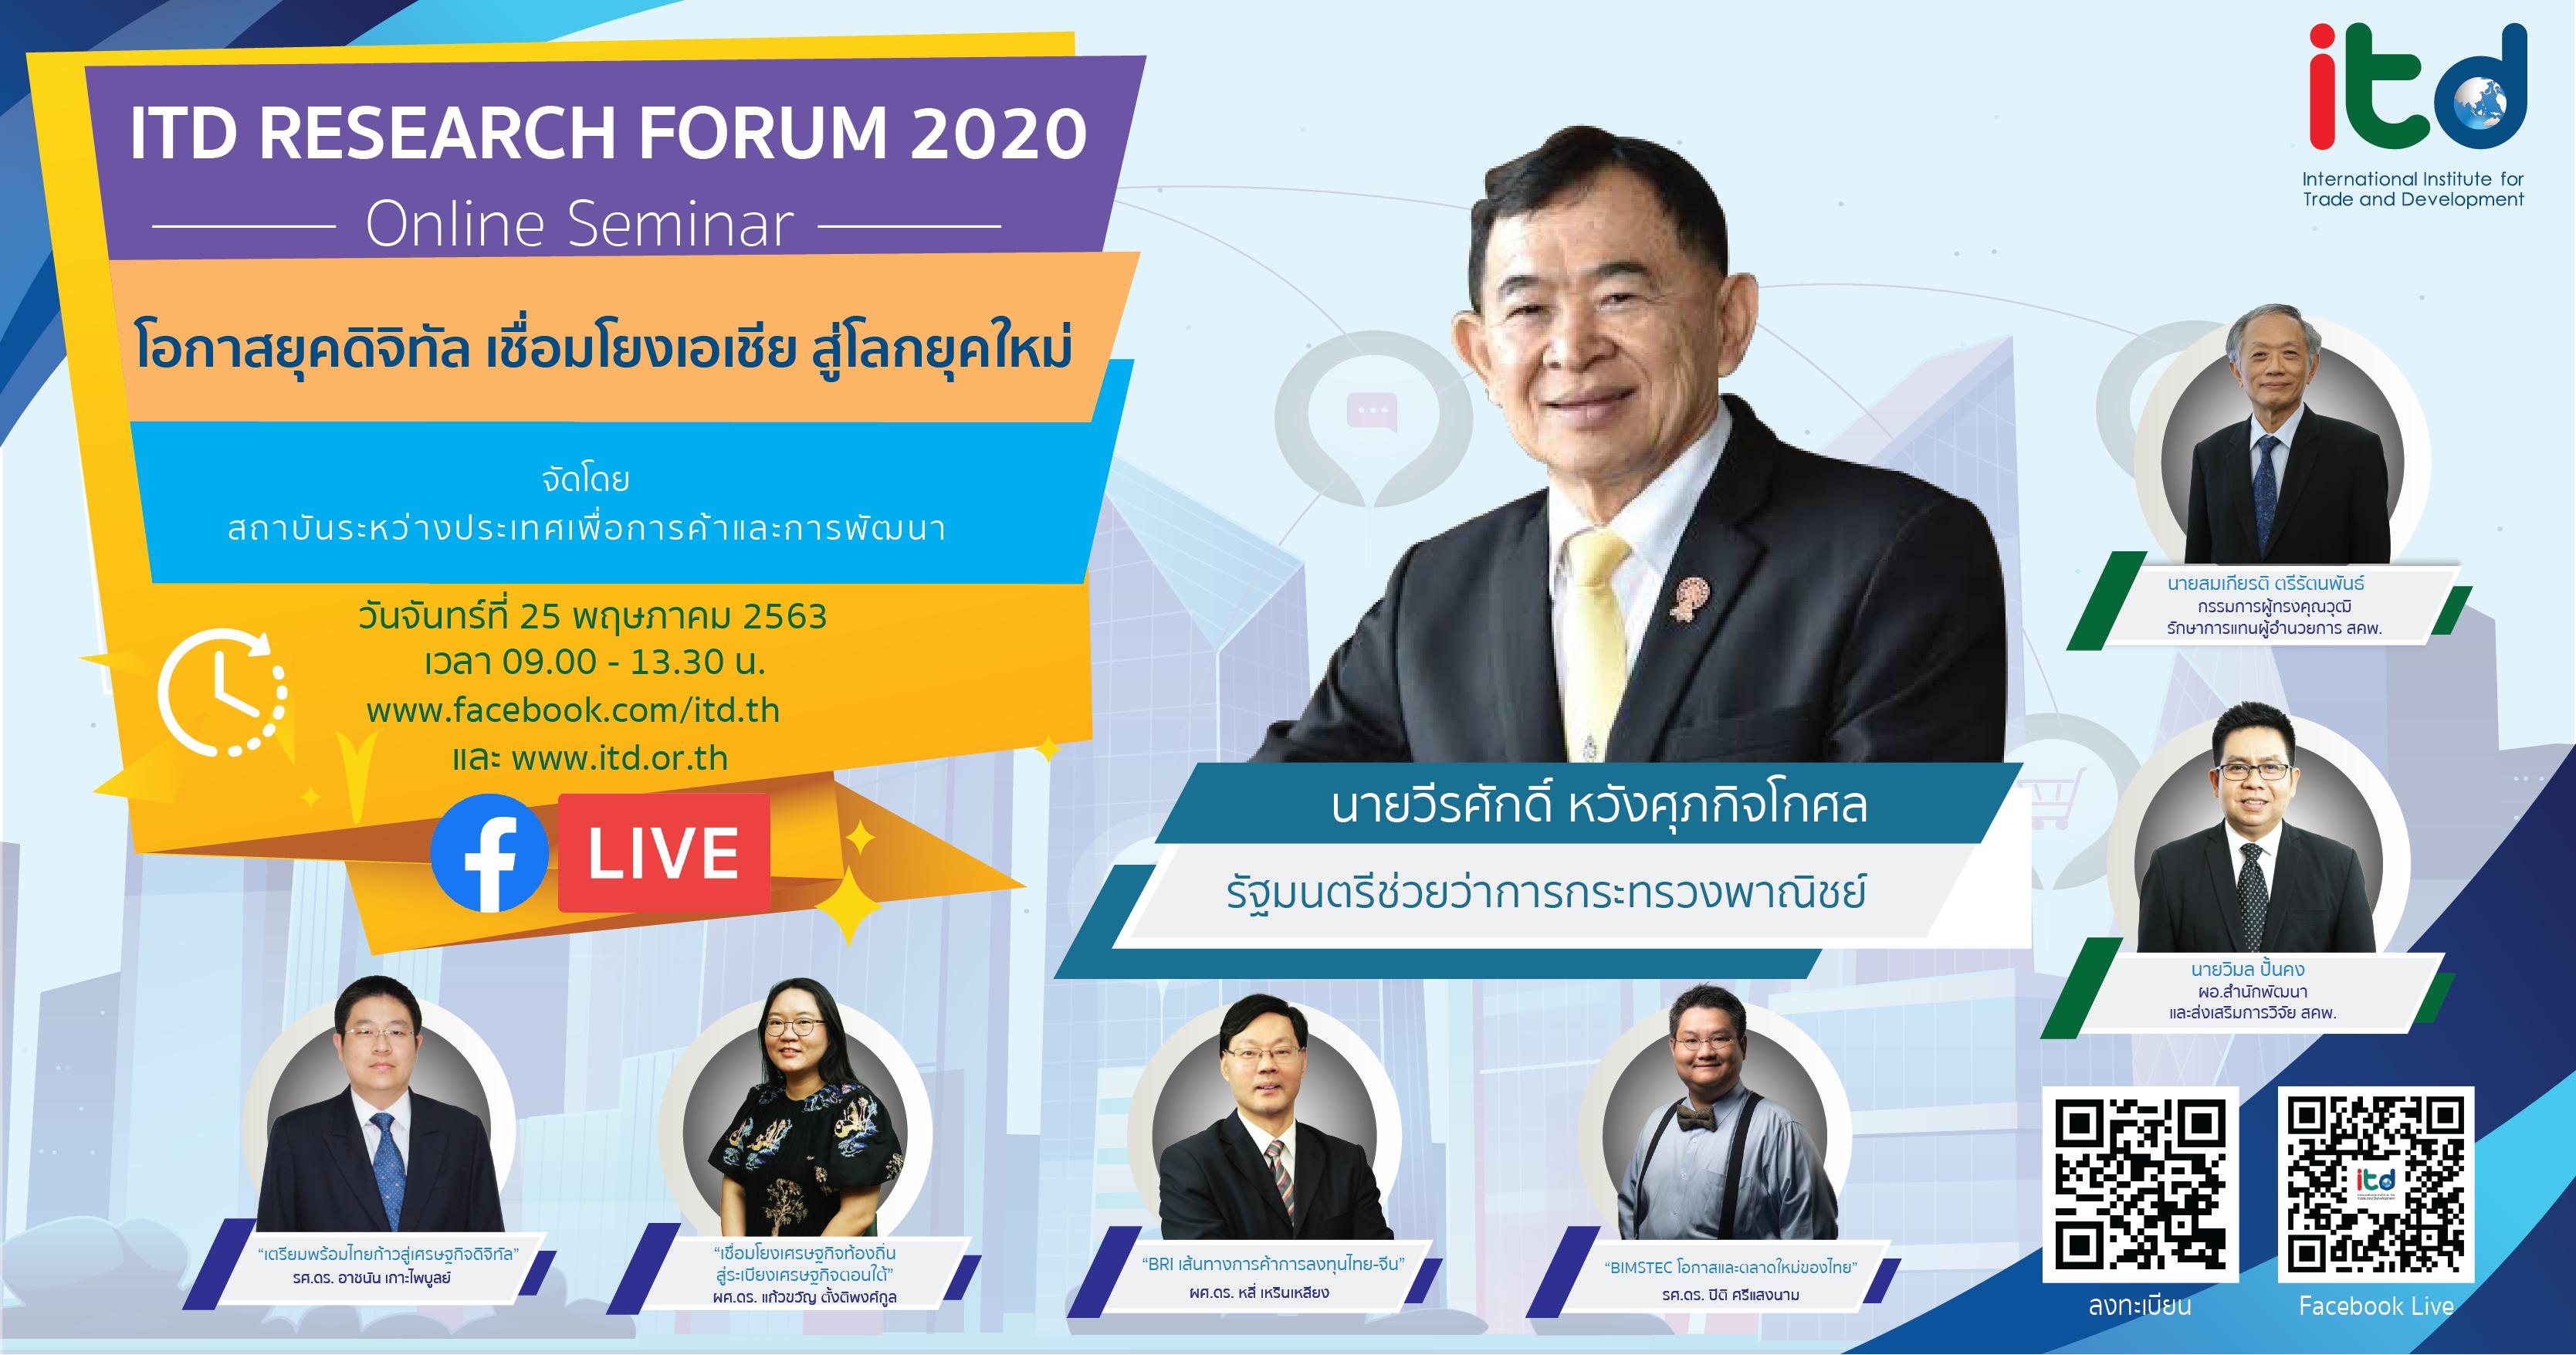 ITD Research Forum 2020 – Online Seminar